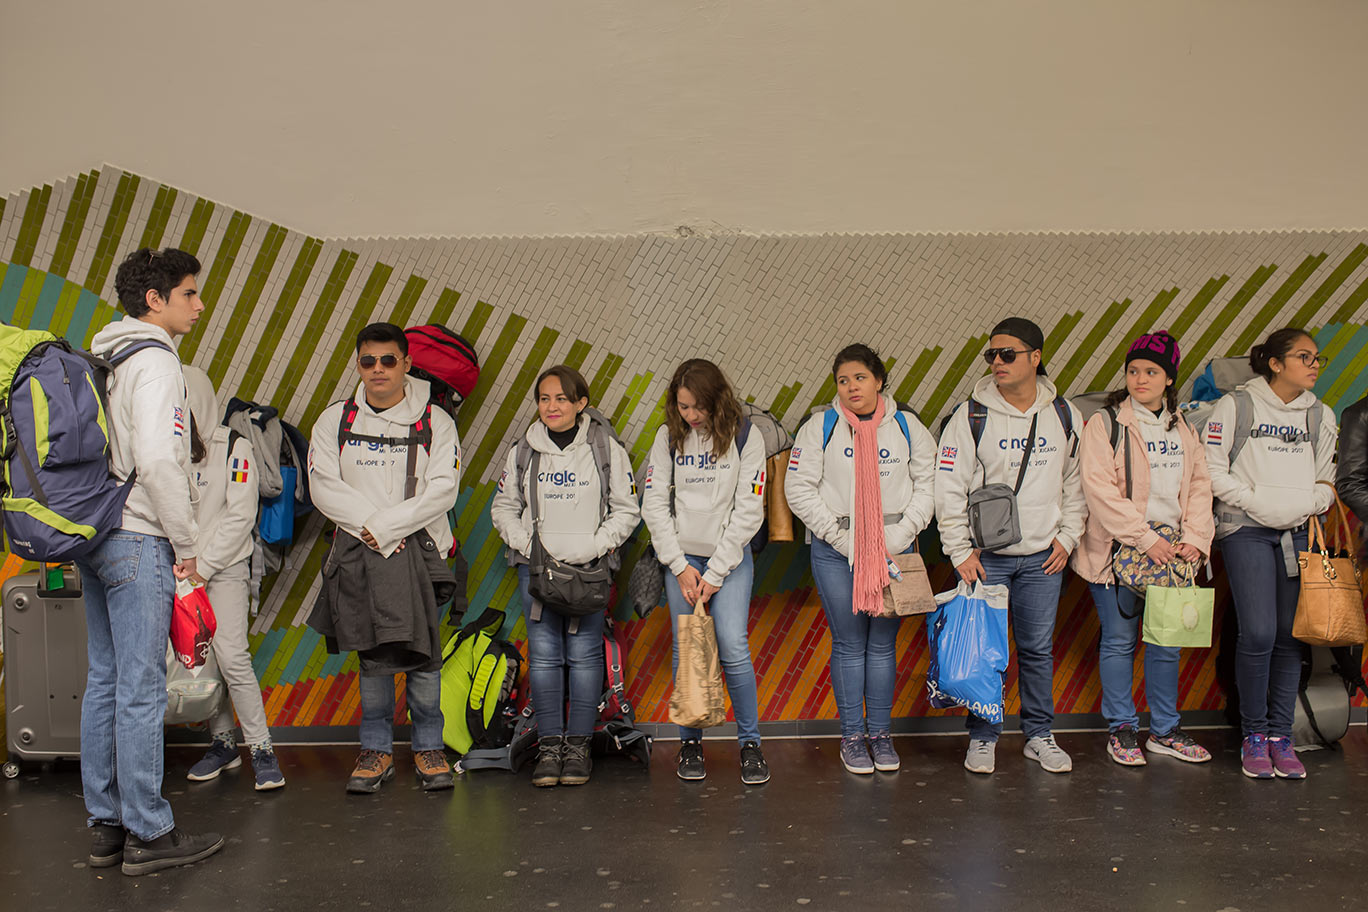 instituto-de-estudios-superiores-anglo-mexicano---programa-de-intercambio-europa-2017-5